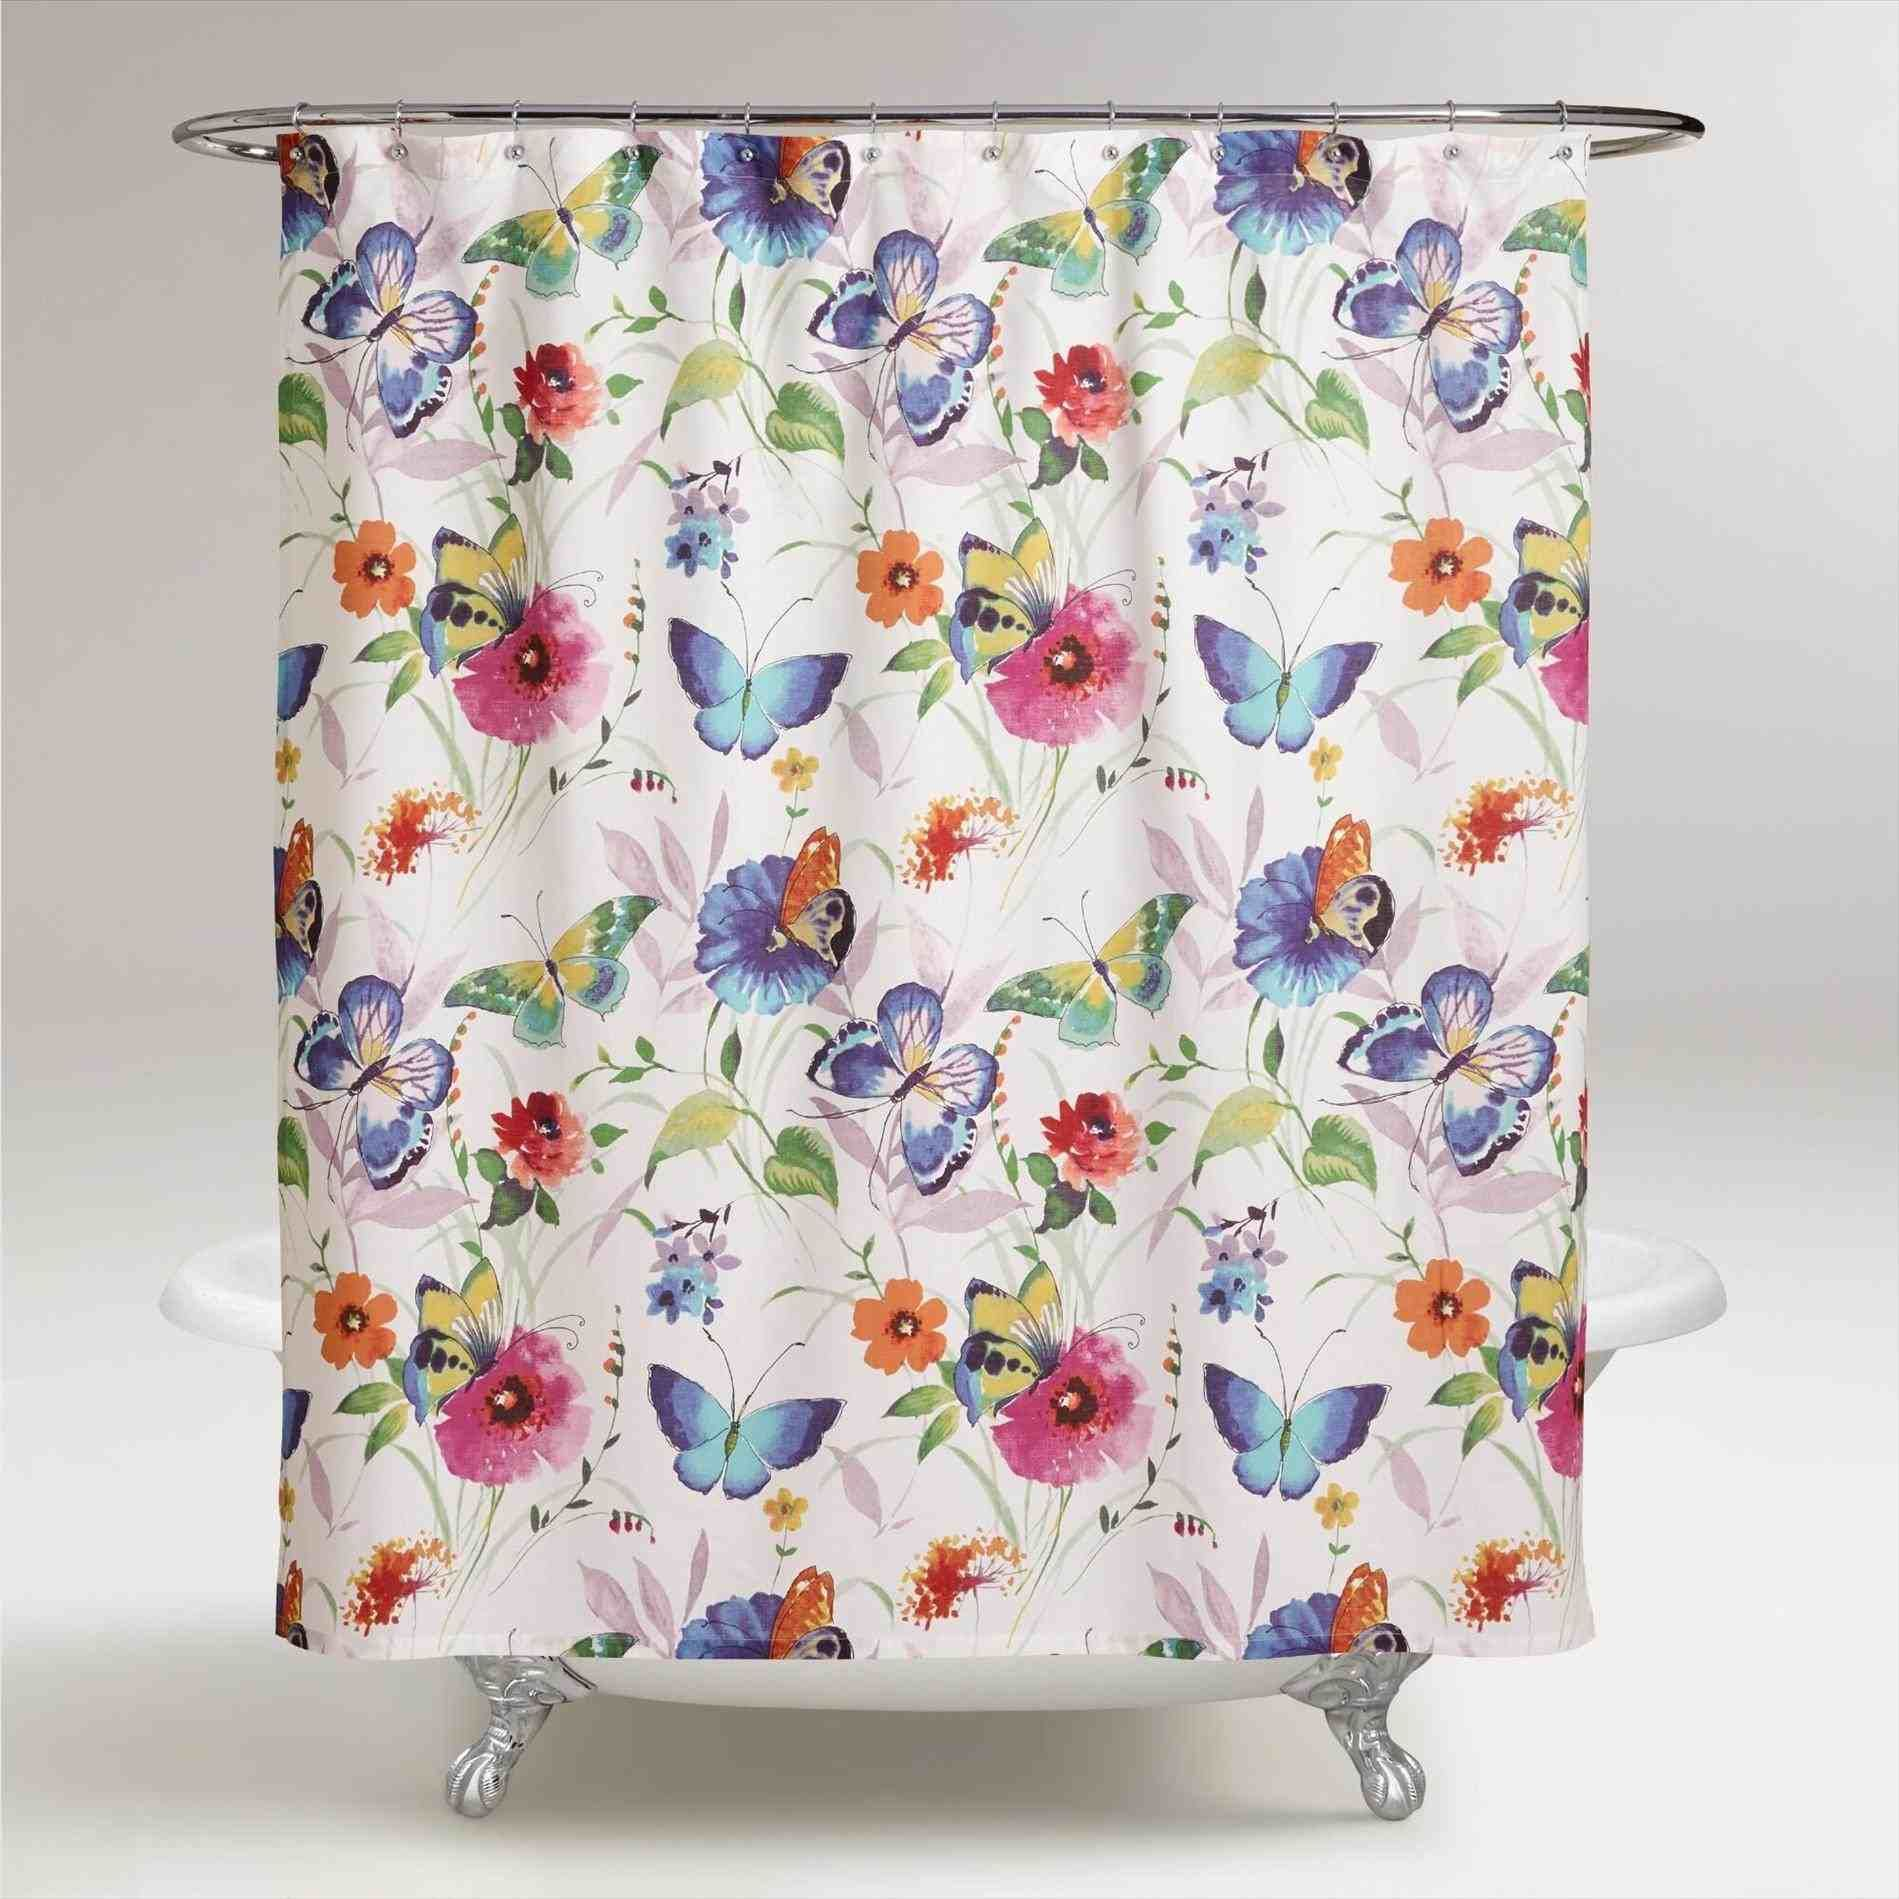 New Post Floral Bathroom Decor Visit Bathroomremodelideassclub